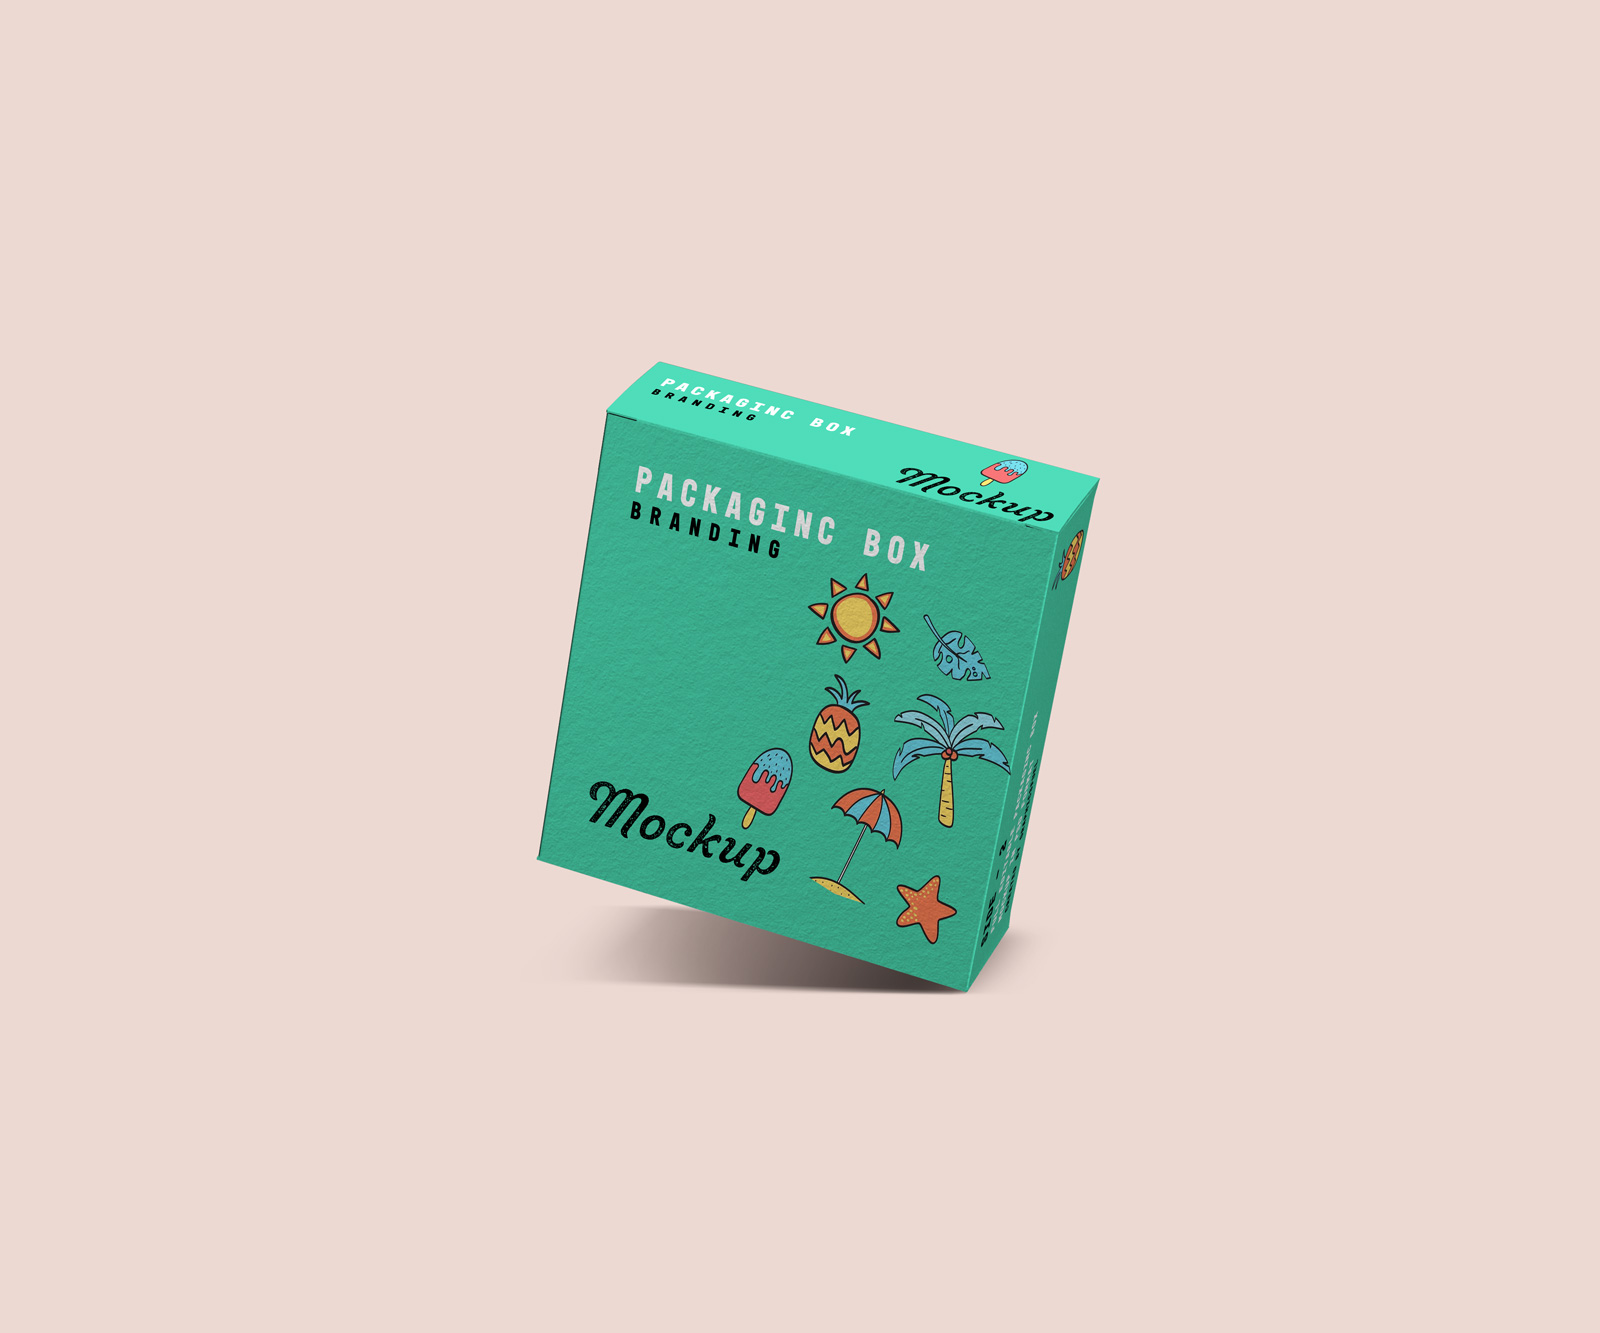 Free Square Packaging Box Mockup Templates